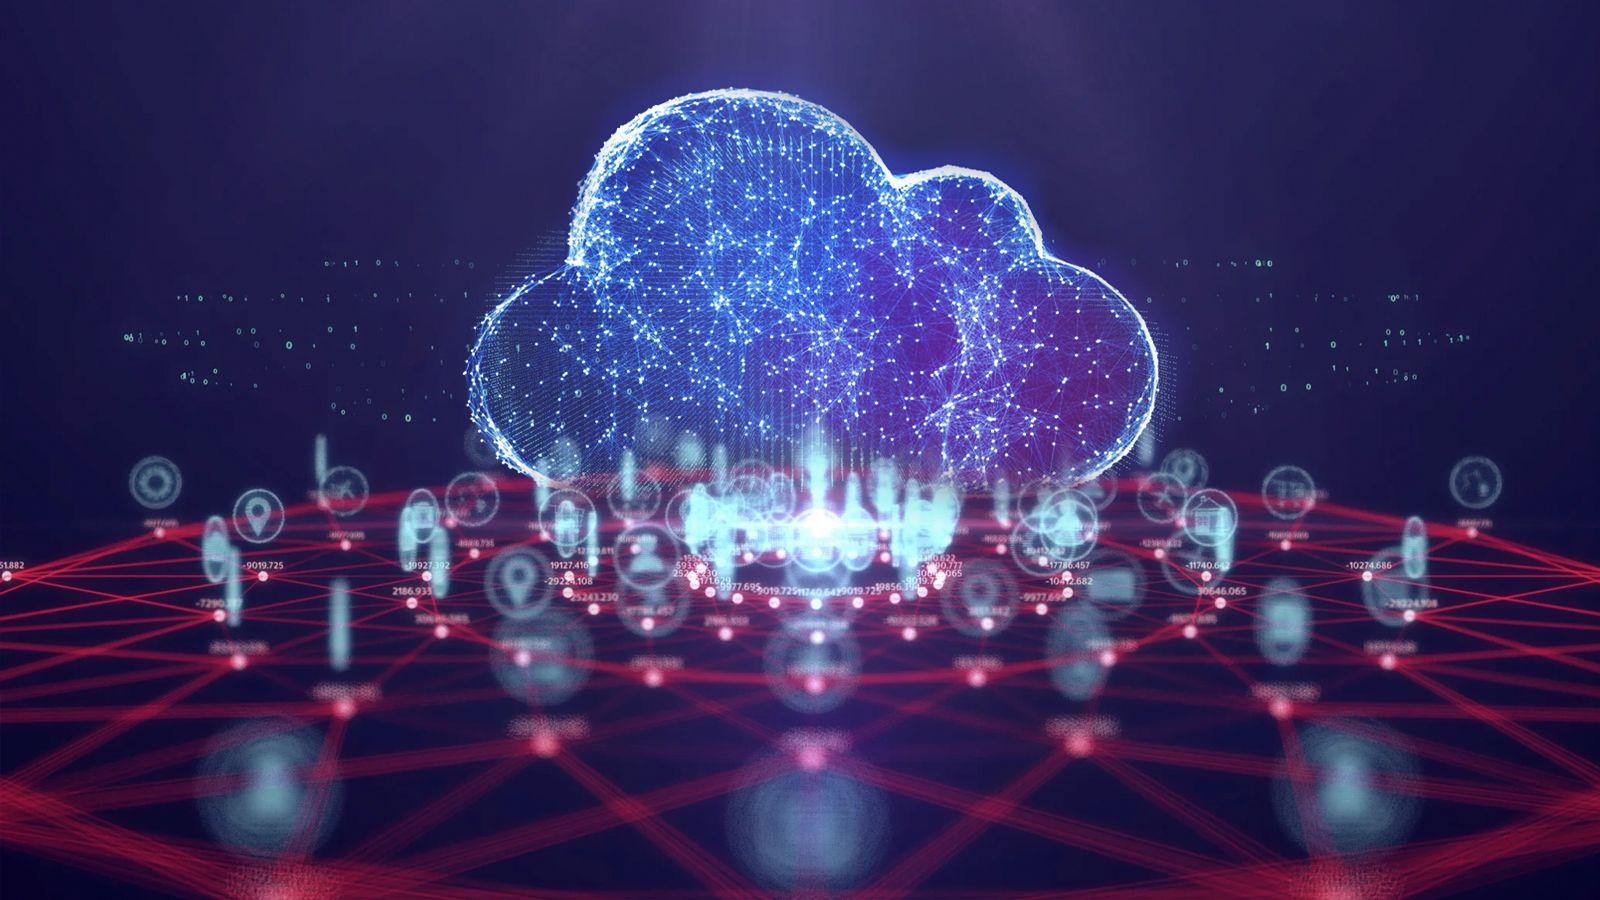 An illustration of cloud technology